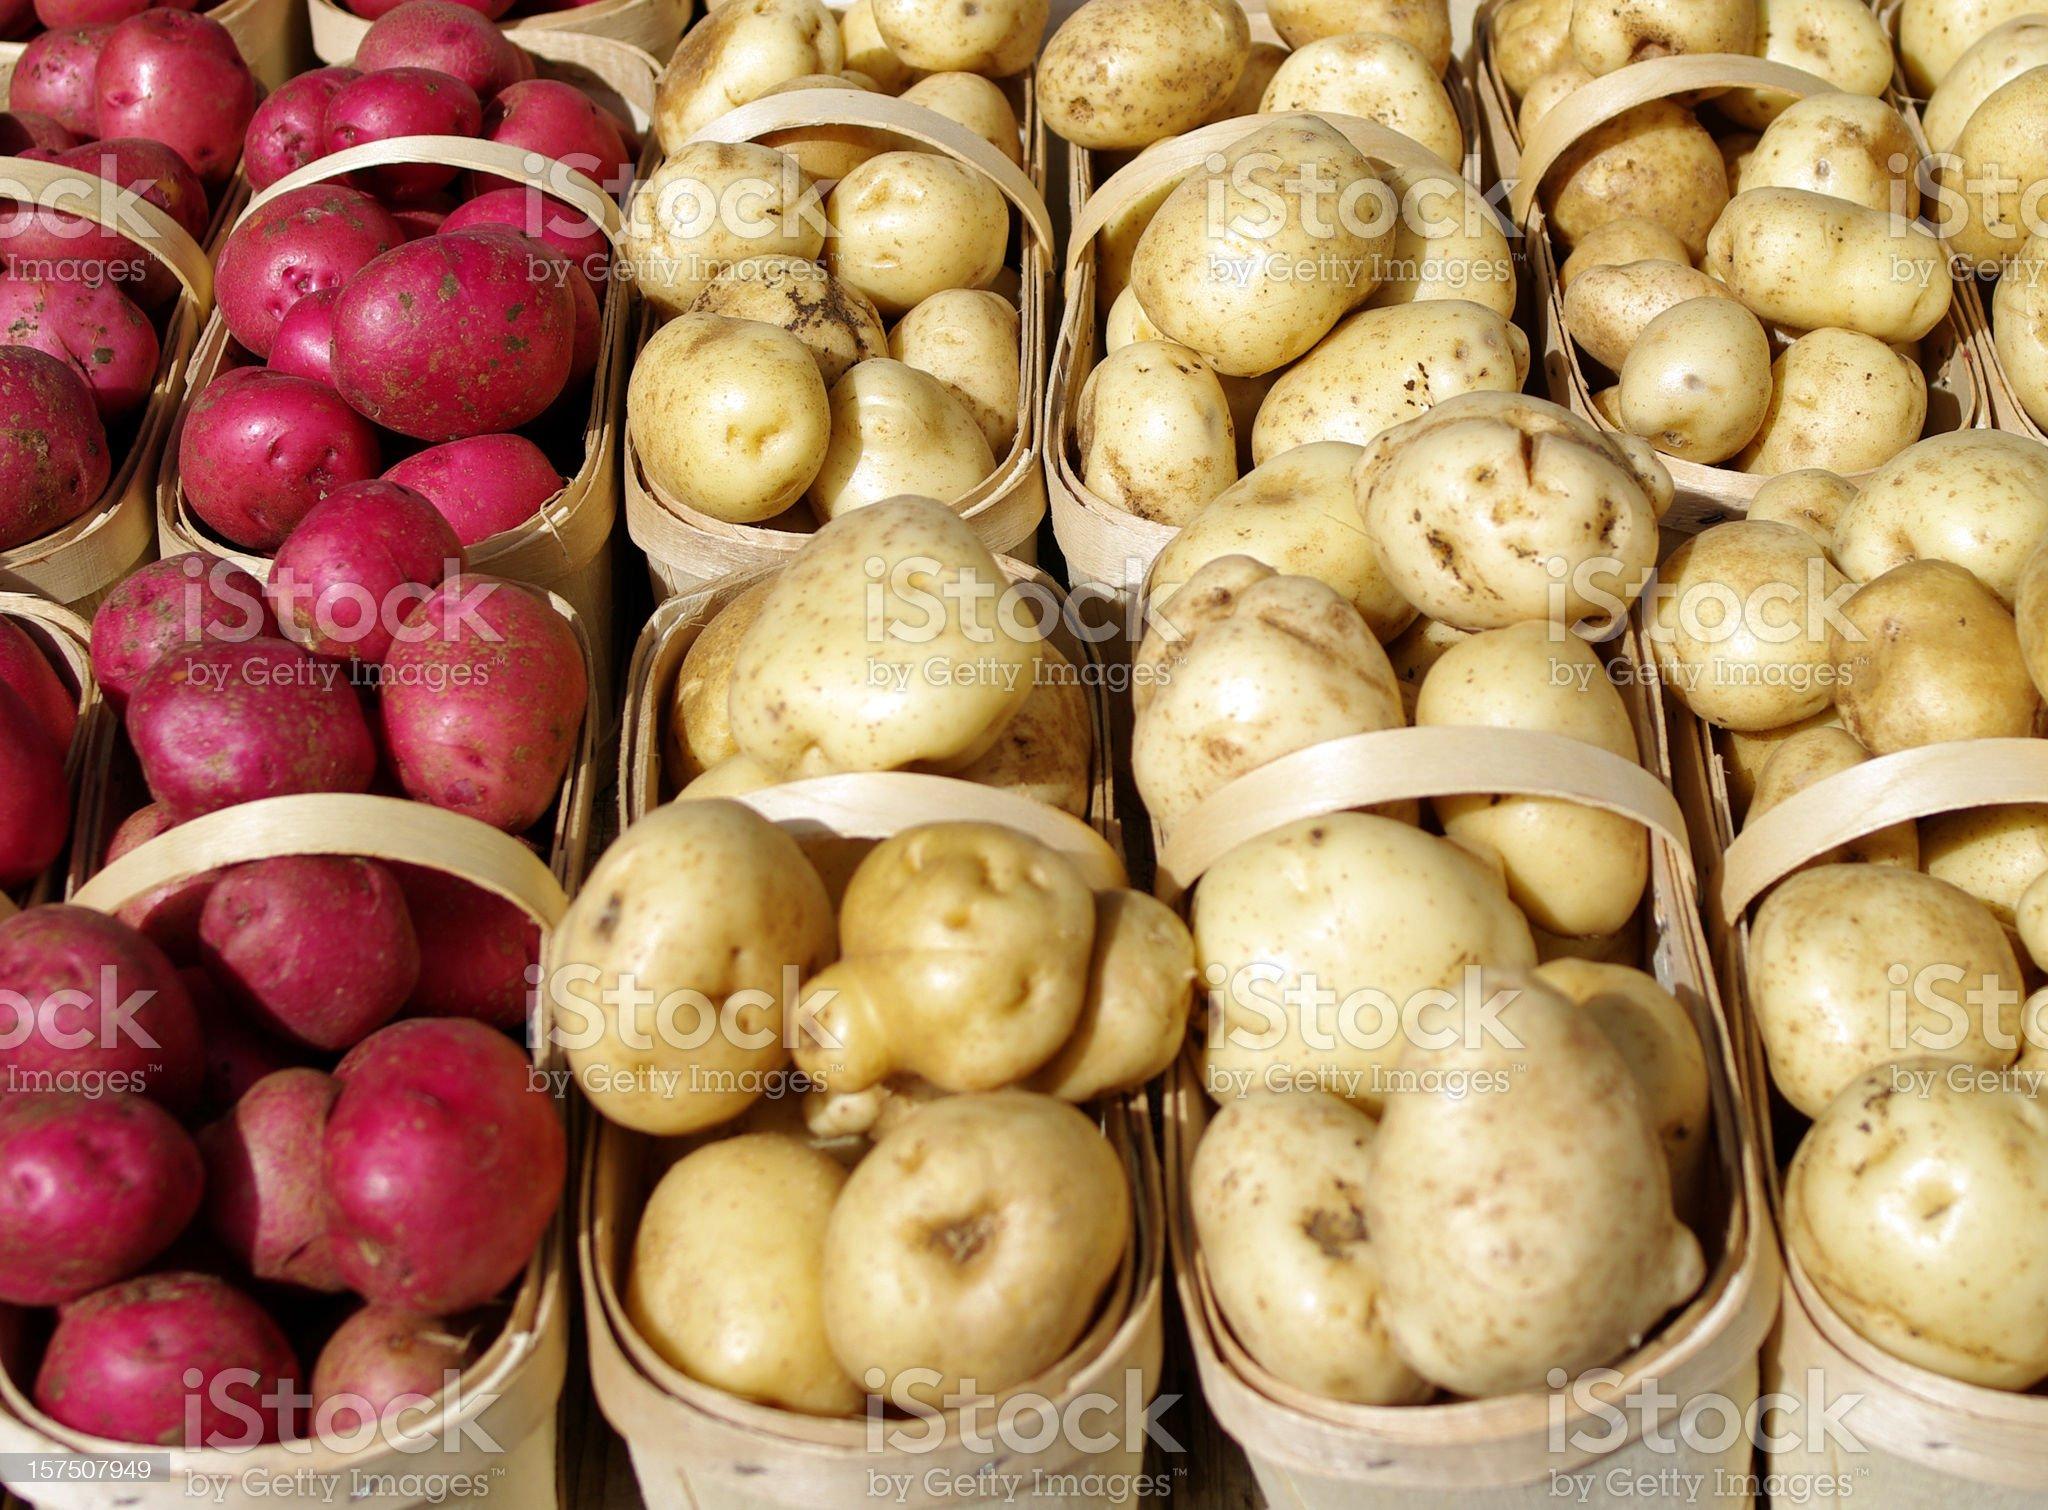 Fresh Potatoes royalty-free stock photo